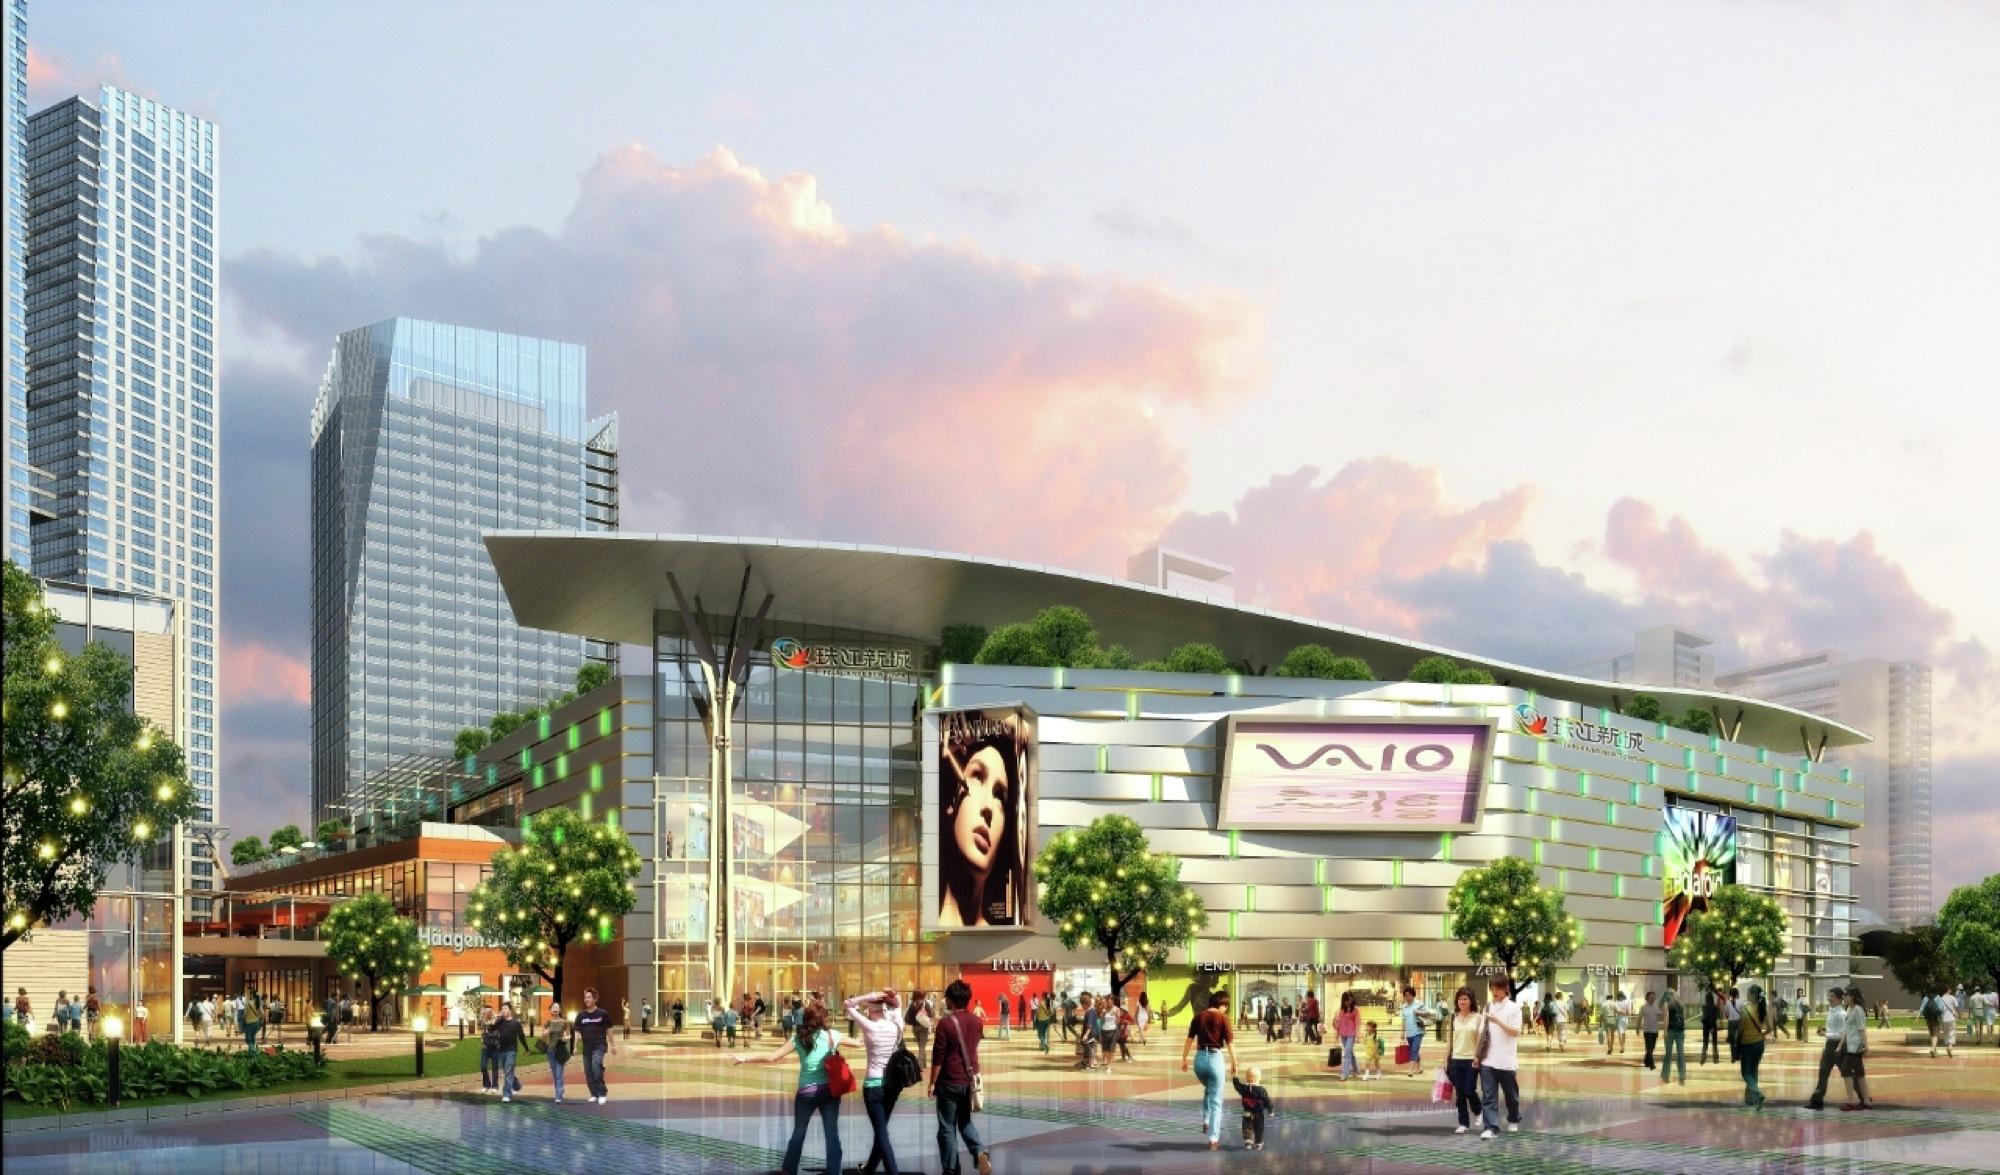 New chengdu city center rtkl archdaily for Landscape design center